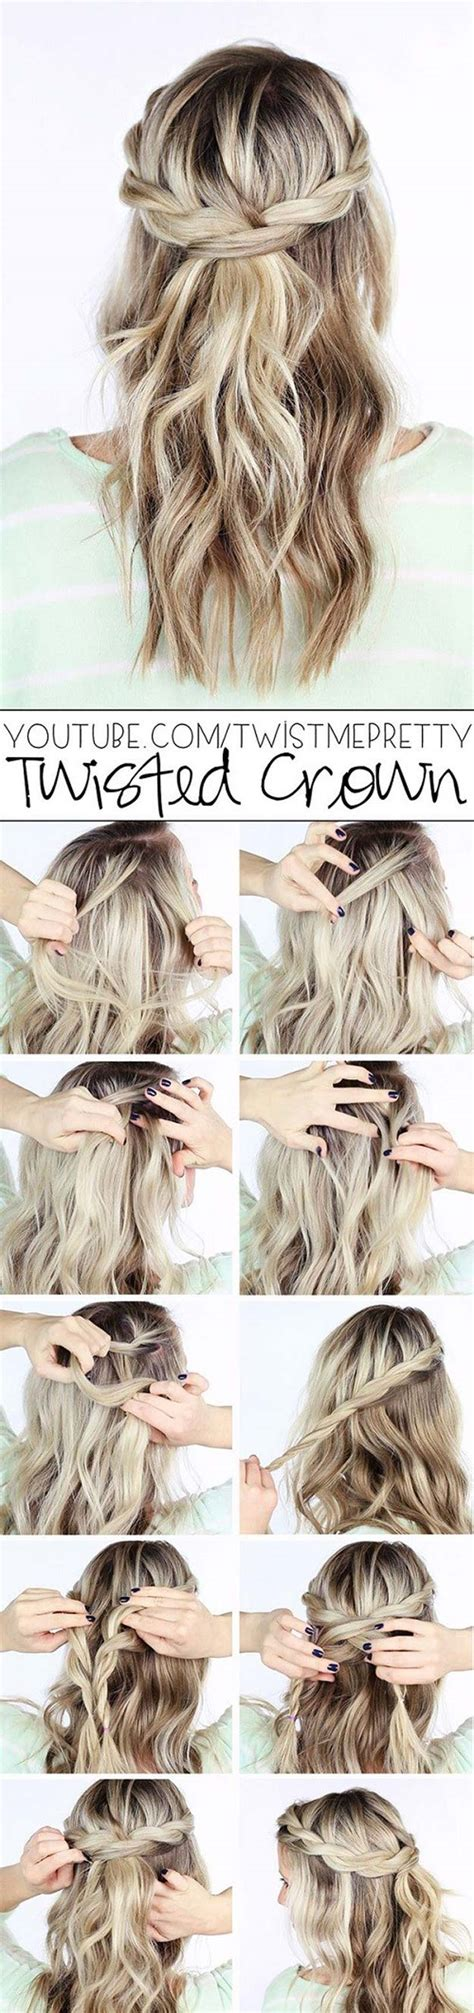 cool braided hairstyles step by step 40 of the best cute hair braiding tutorials